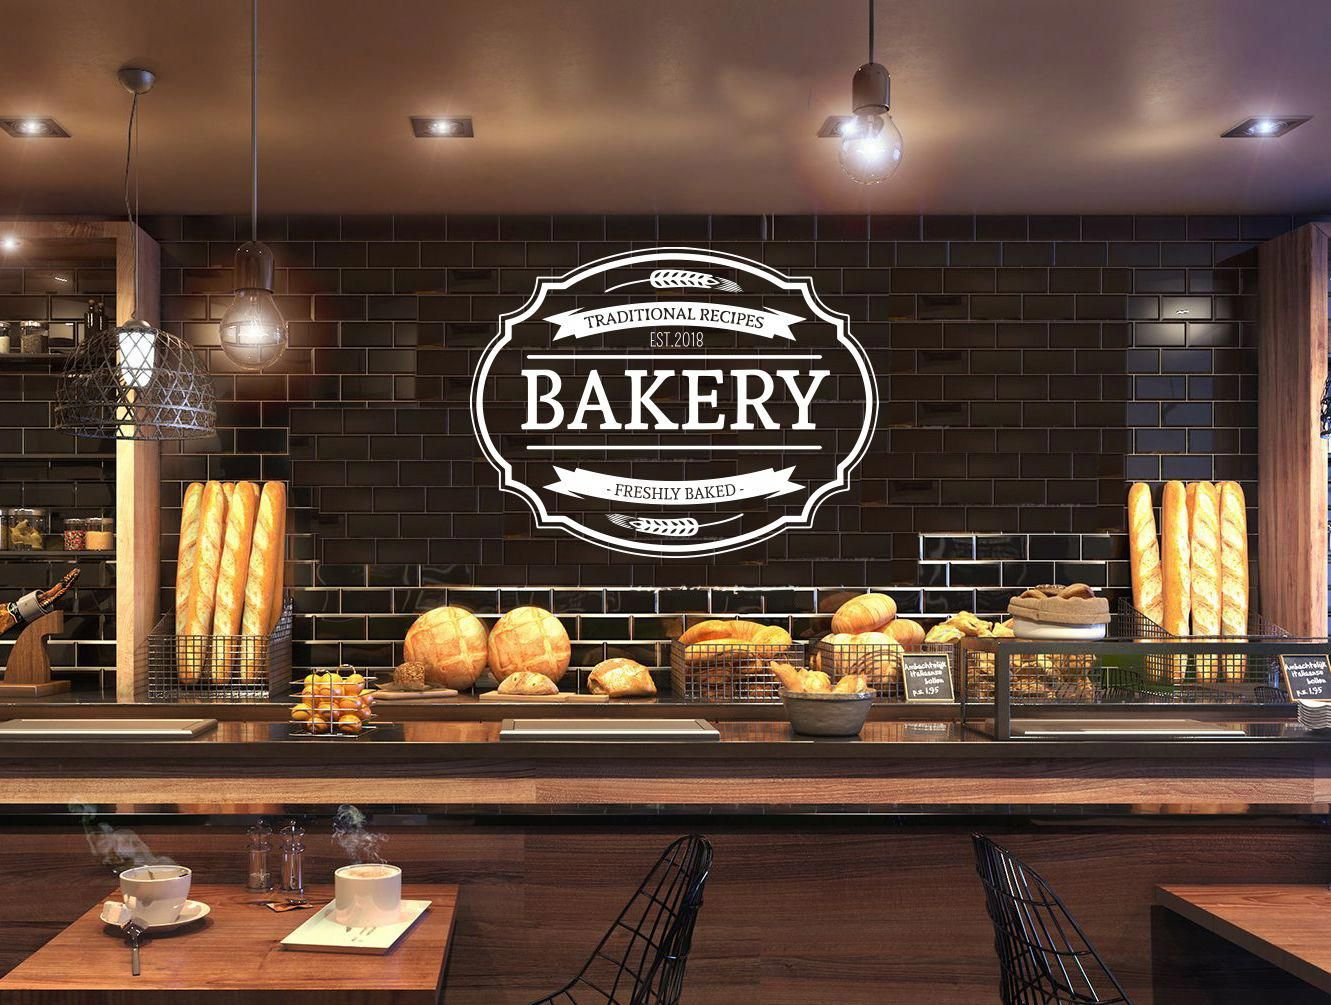 Home Decoration For Small House Homedecorationbuyonline Bakery Shop Interior Bakery Decor Bakery Shop Design